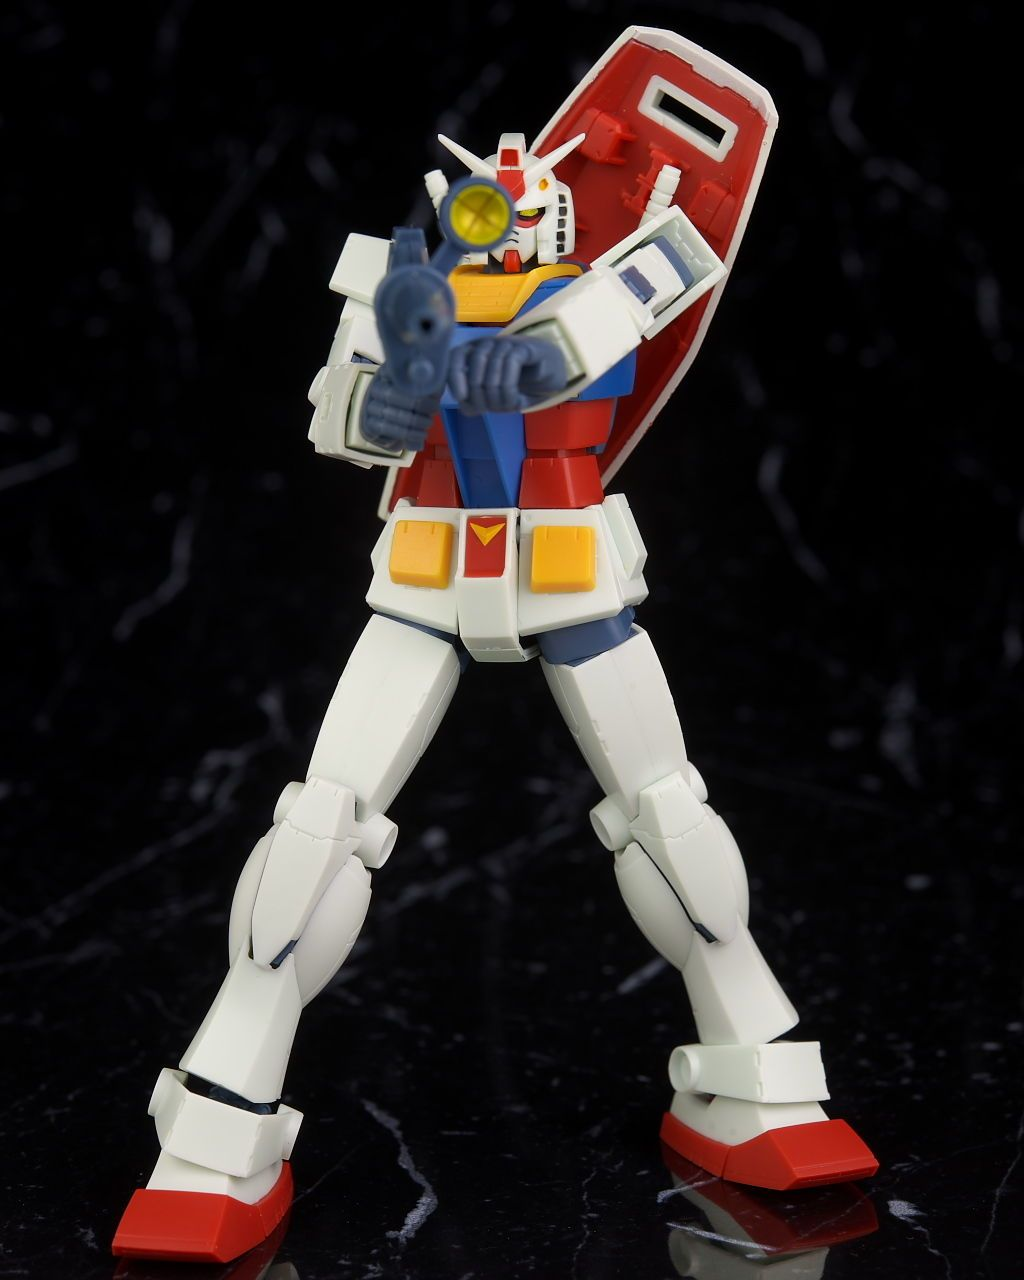 http://gundamguy.blogspot.com/2016/02/robot-spirits-rx-78-2-gundam-ver-anime.html